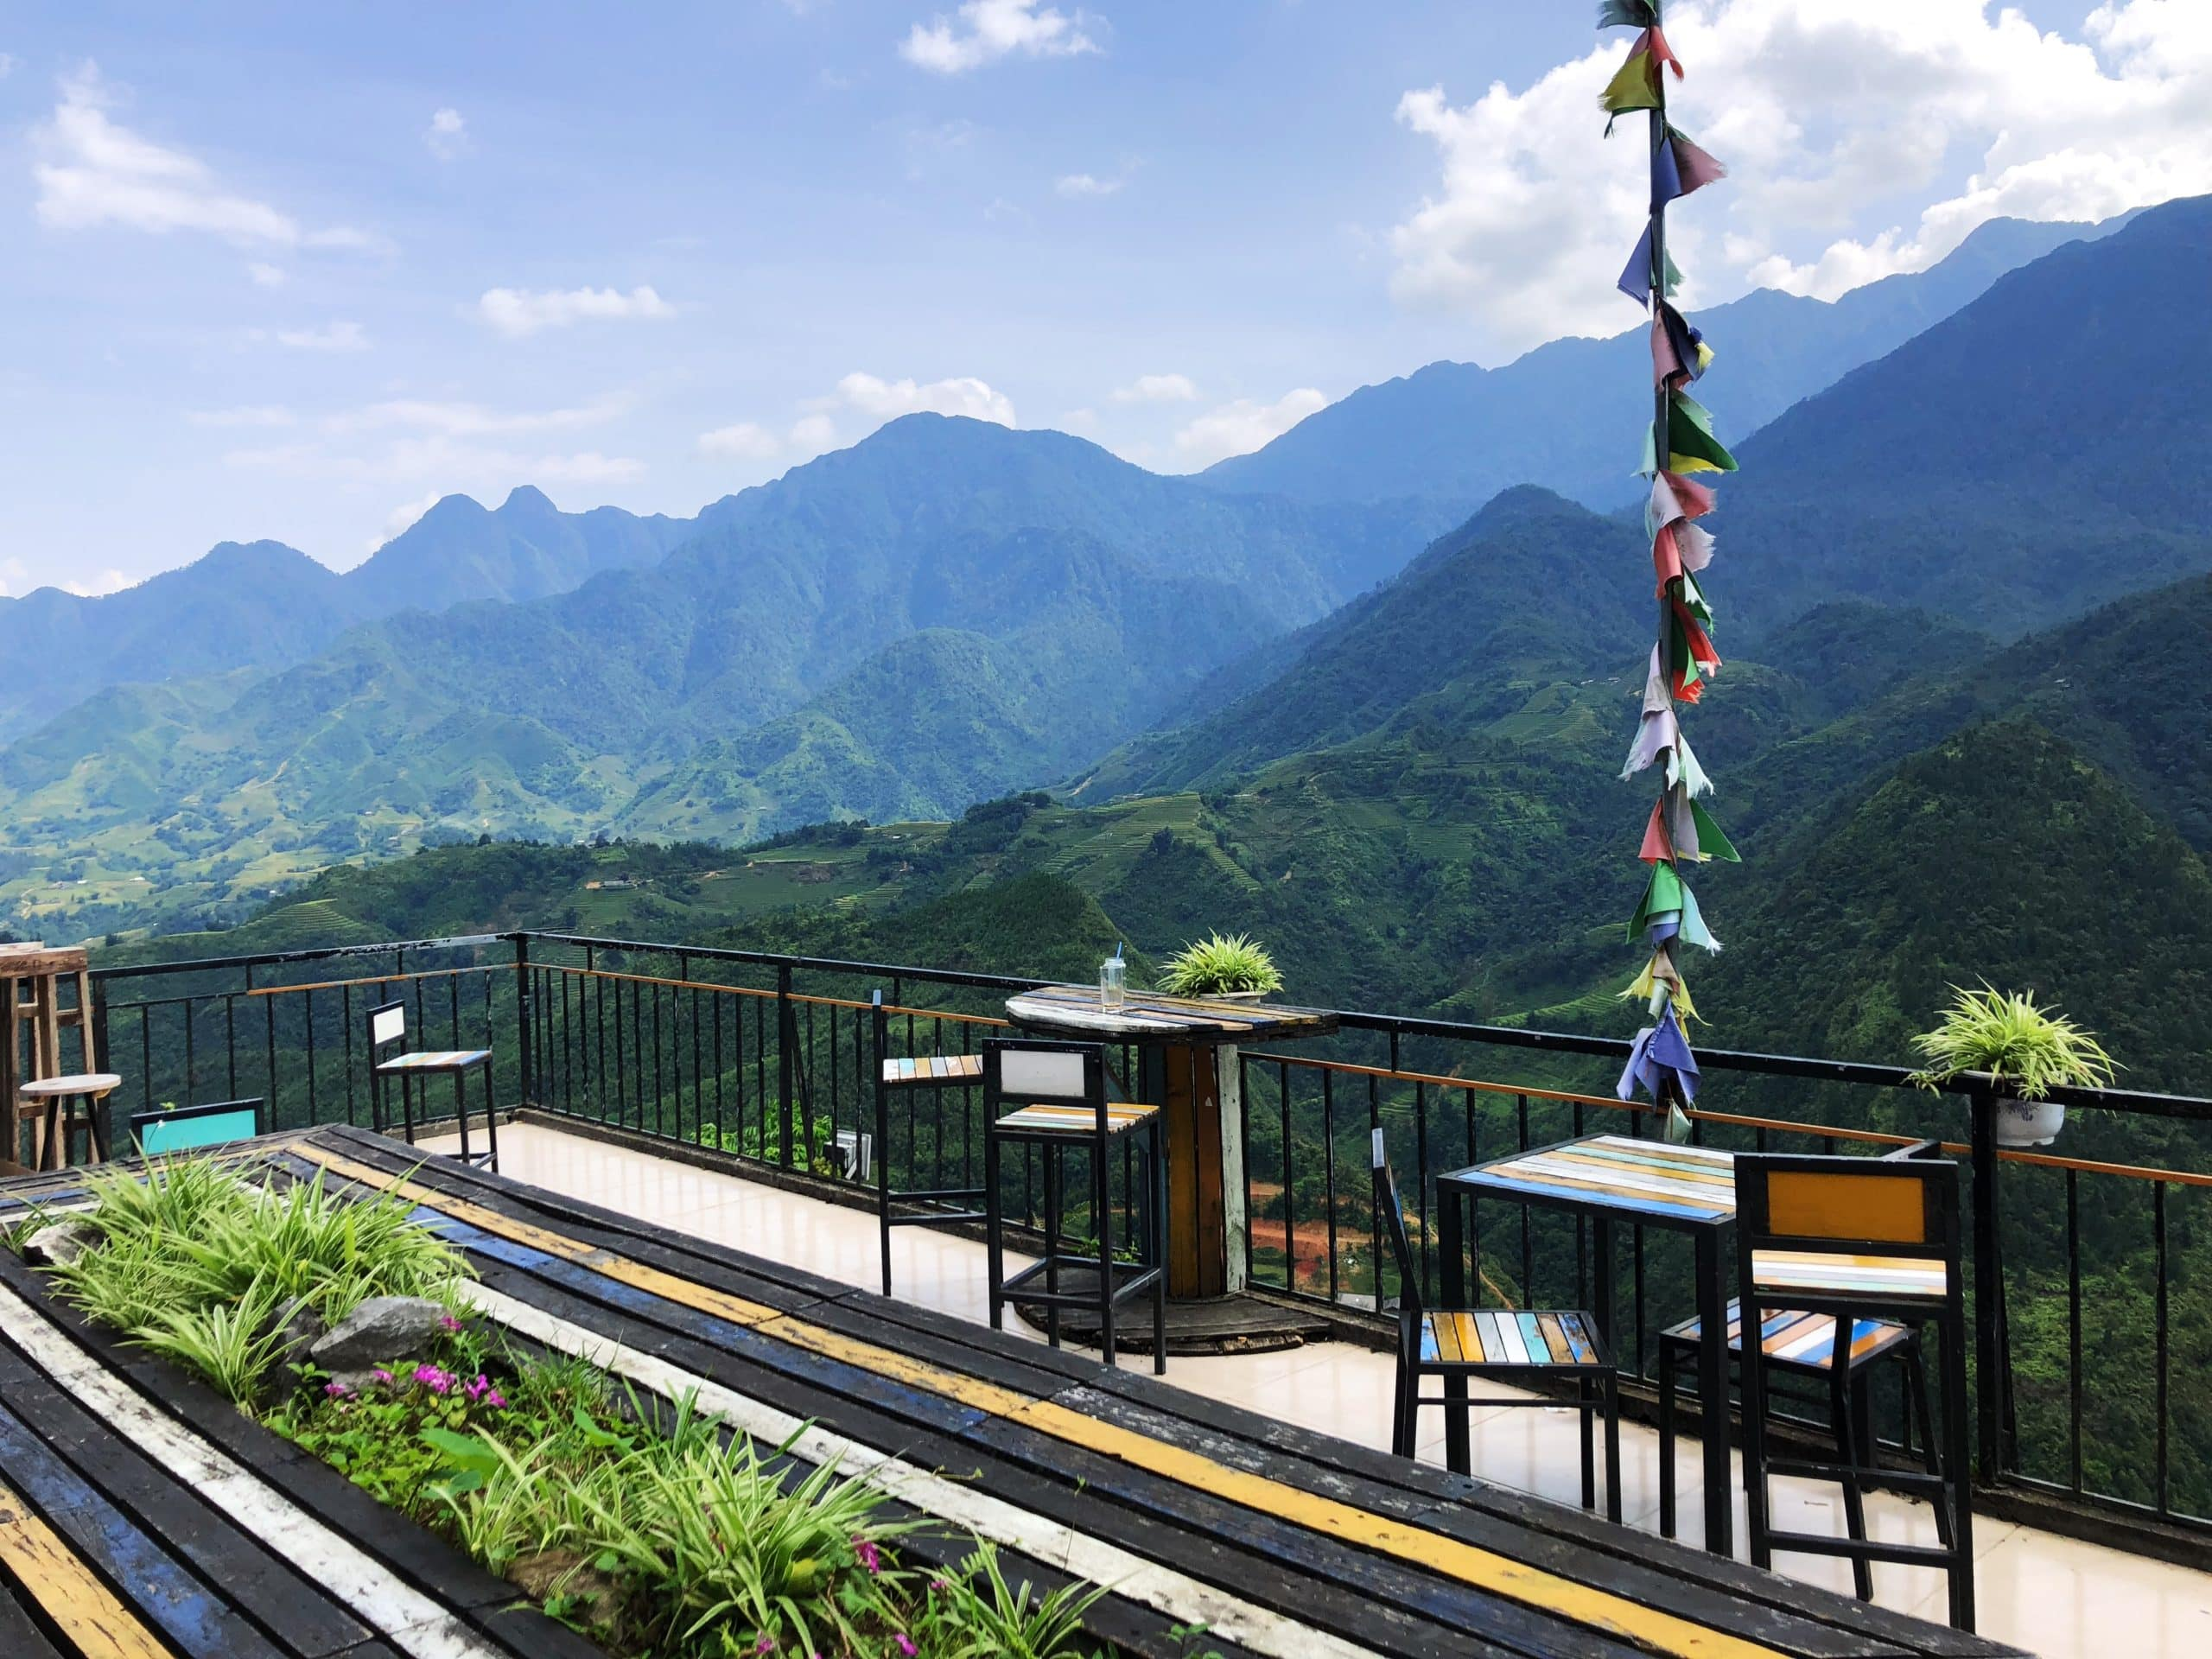 sapa-vietnam-sapa vietnam-sapa tipps-sapa blog-reiseblog-sapa urlaub-sapa reise- sa pa-reisfelder